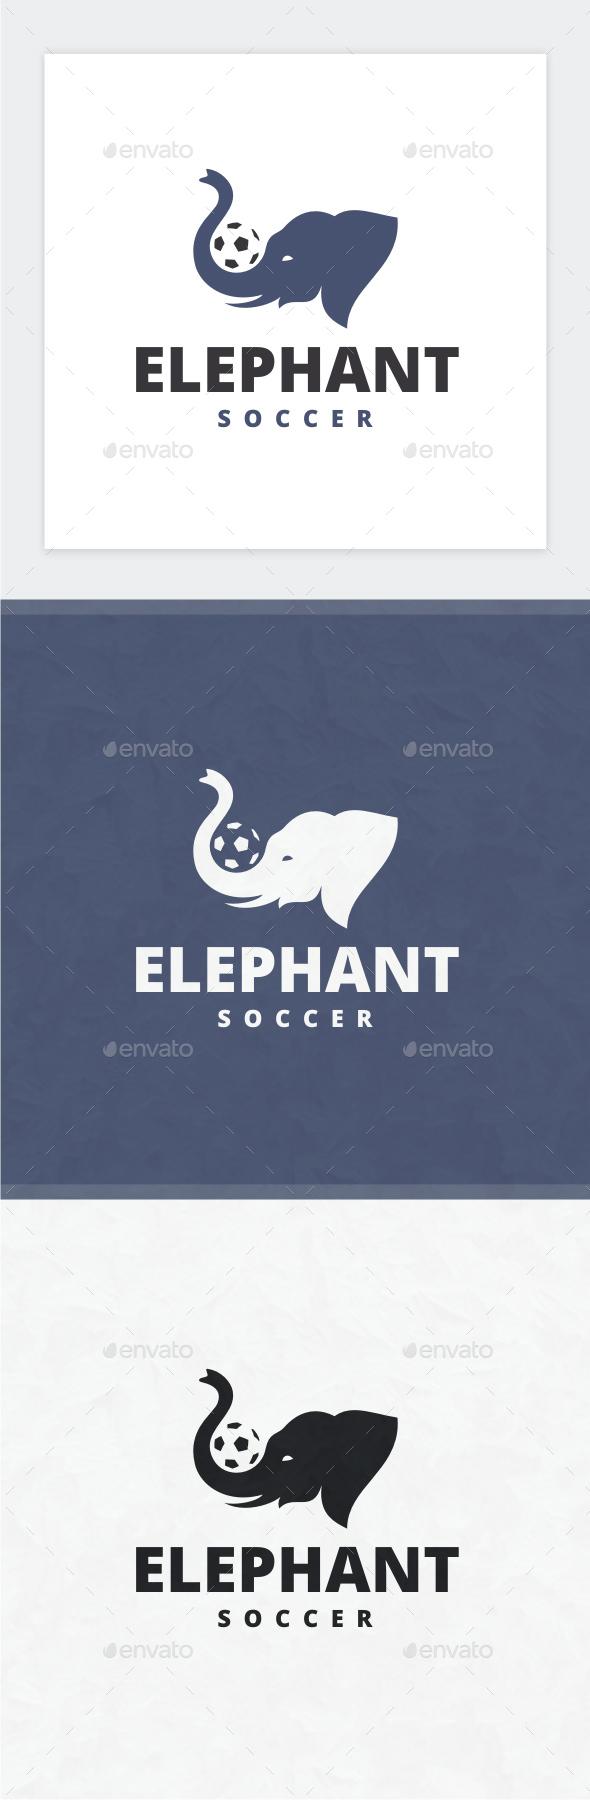 Elephant Soccer Logo - Animals Logo Templates